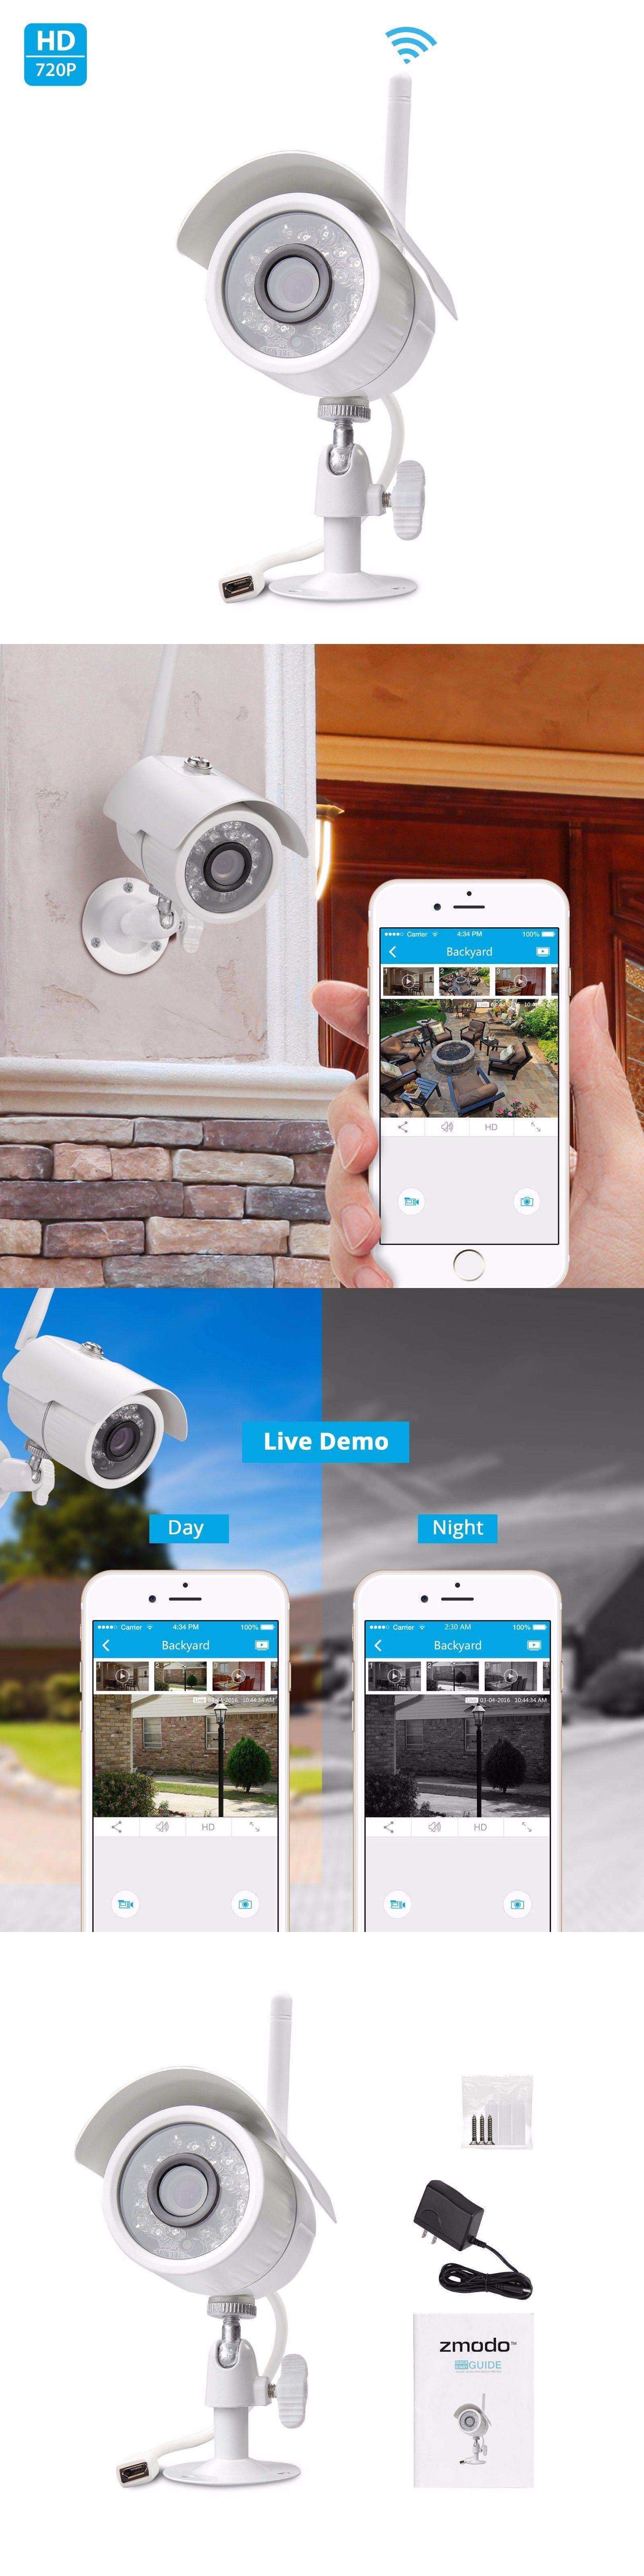 surveillance security systems zmodo 720p hd ip network wireless